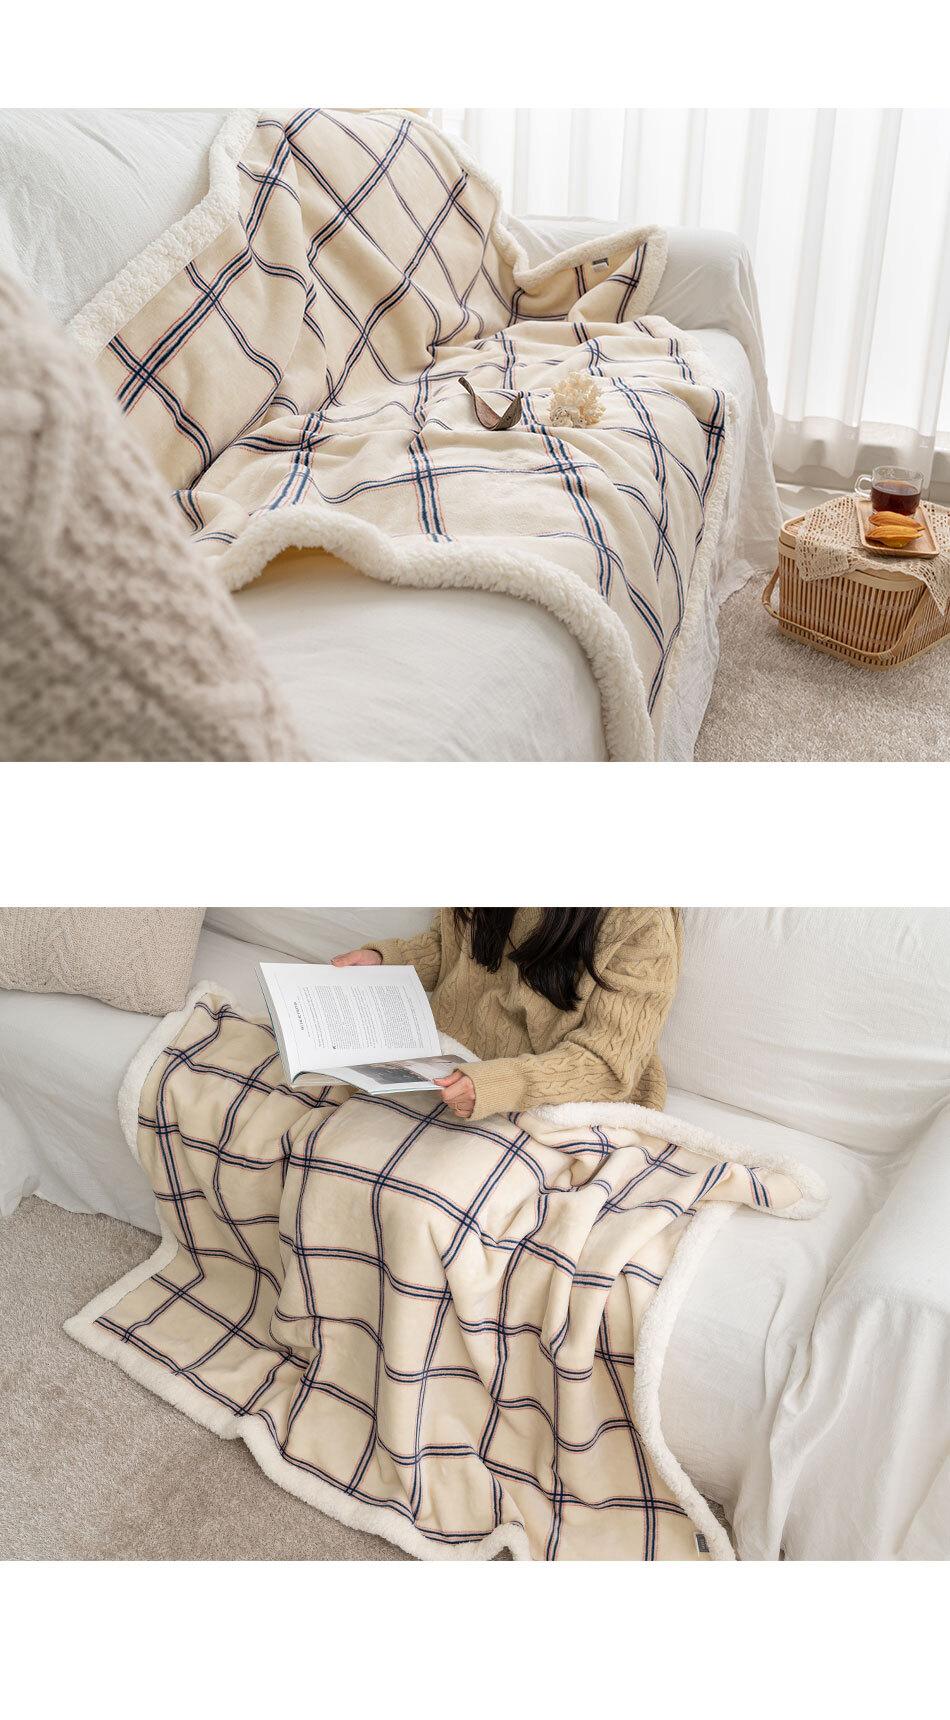 chou_blanket_medium_02.jpg